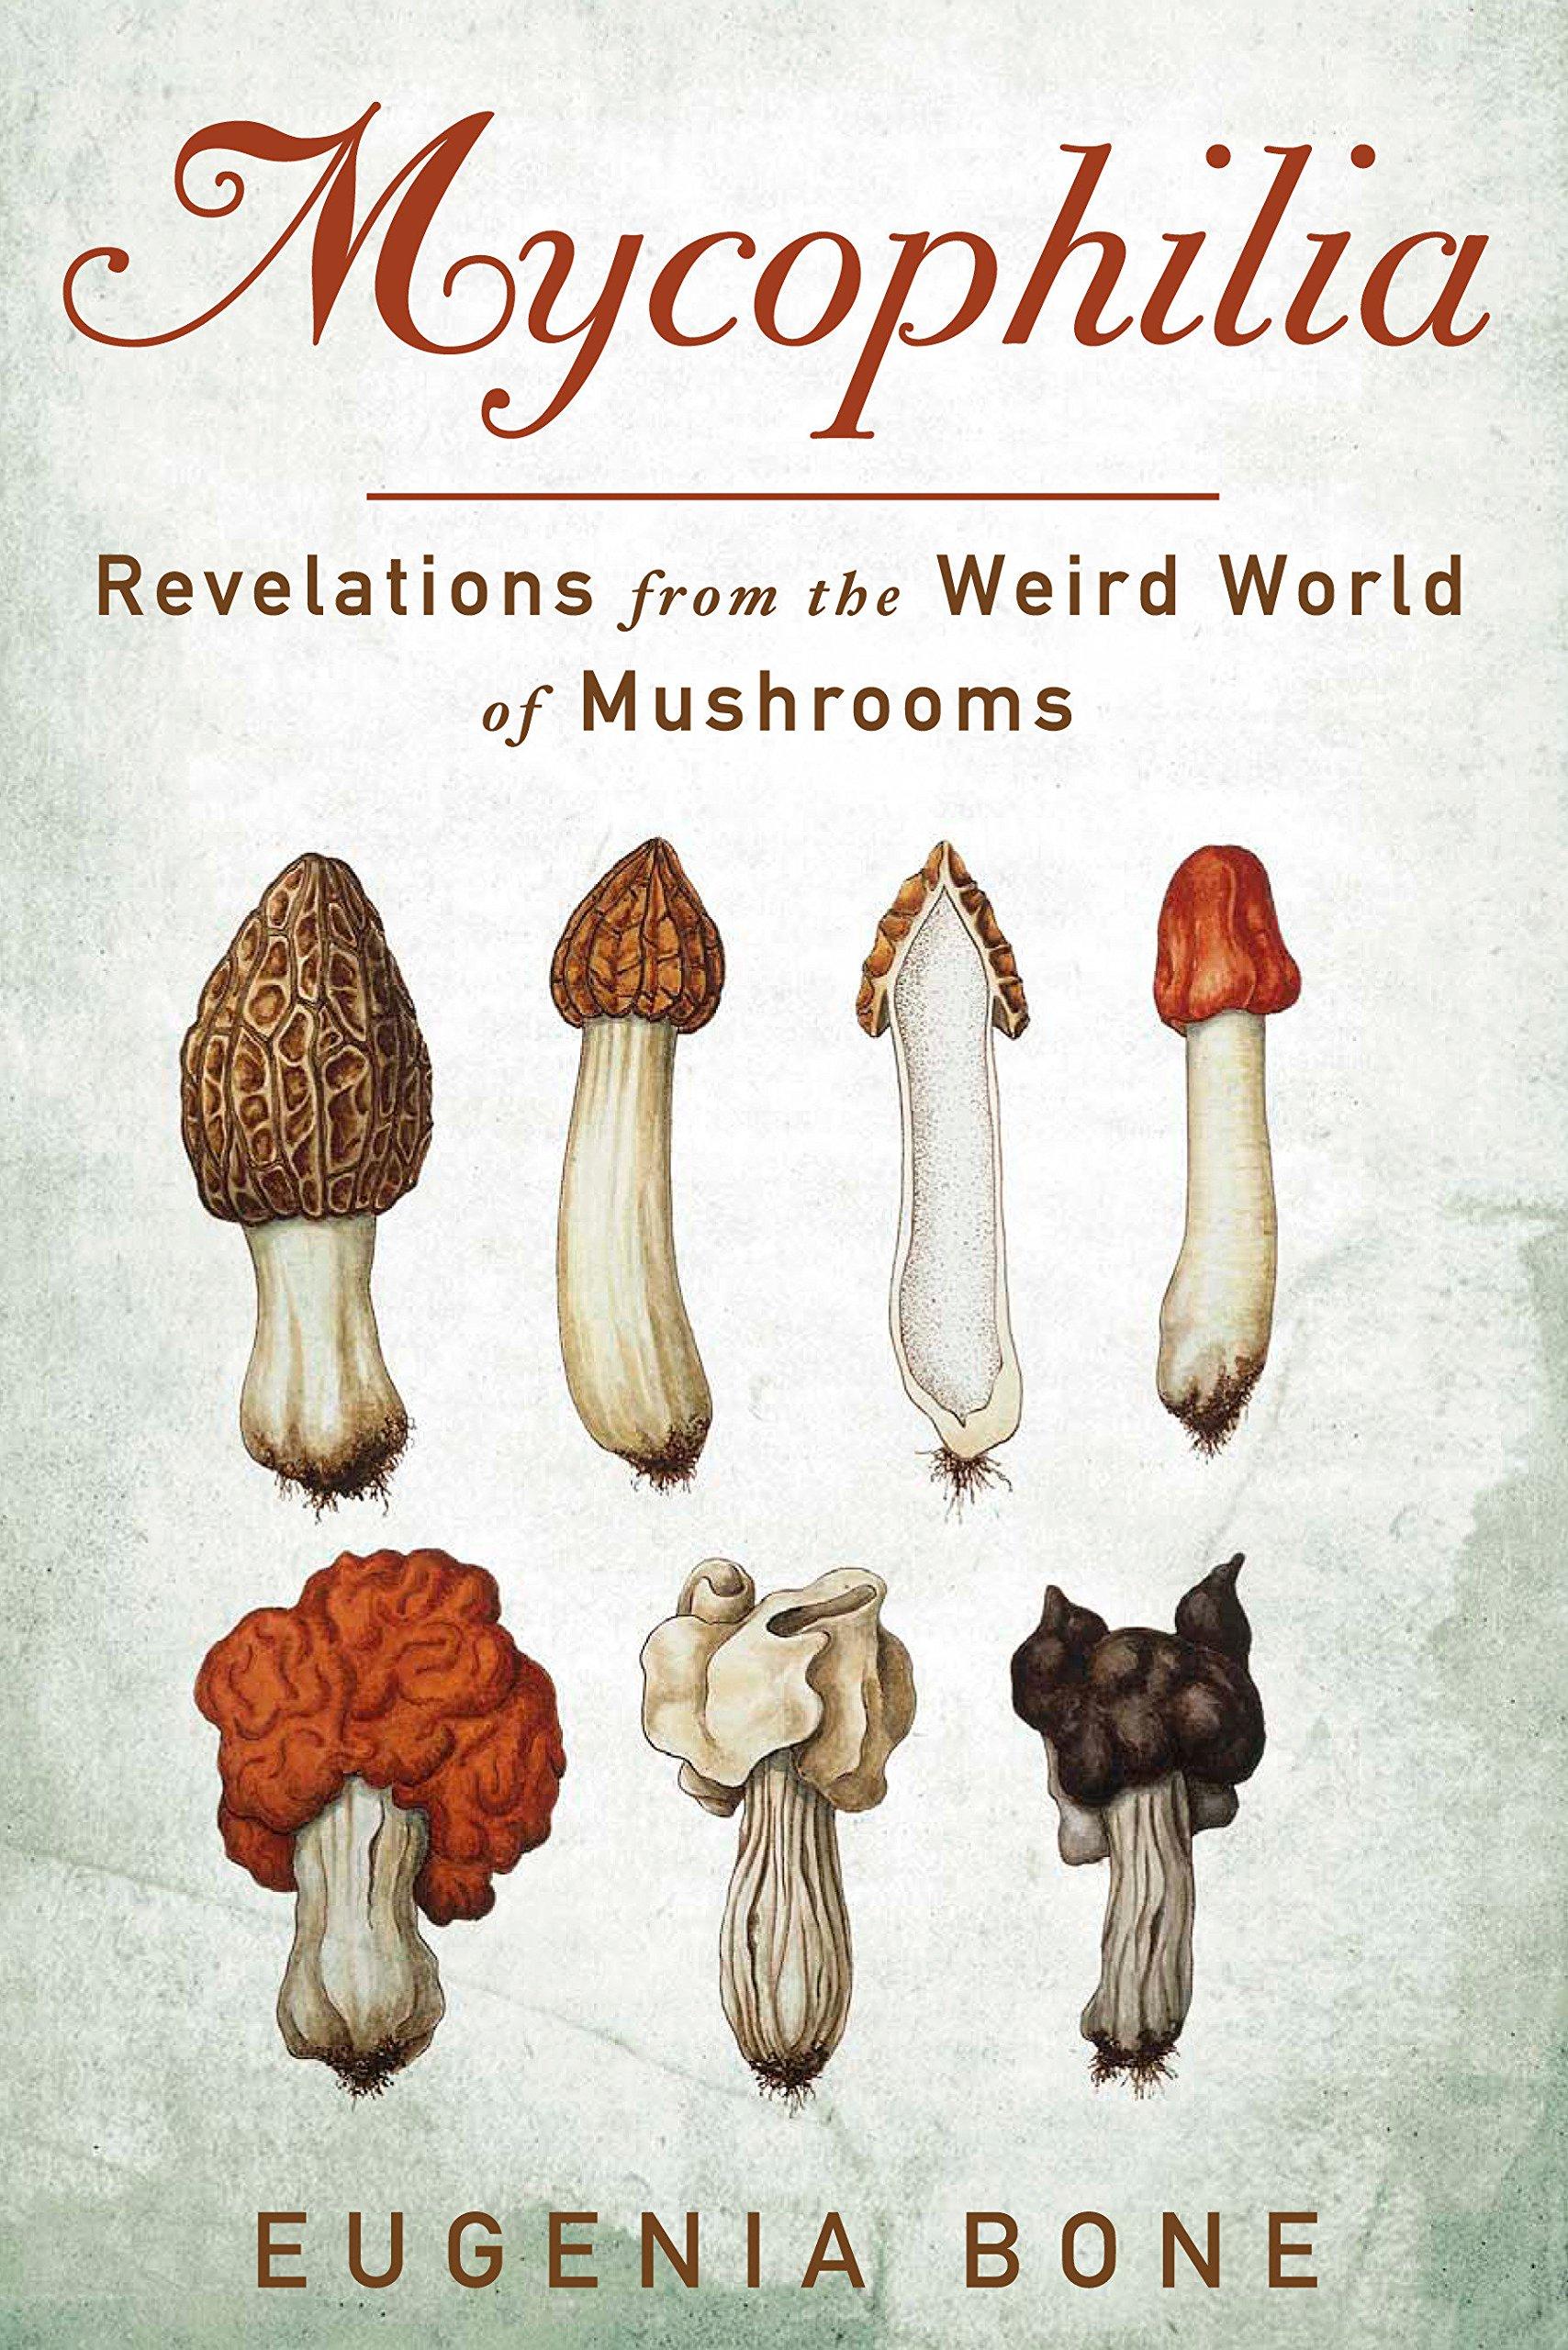 Mycophilia: Revelations from the Weird World of Mushrooms: Eugenia Bone:  9781609619879: Amazon.com: Books